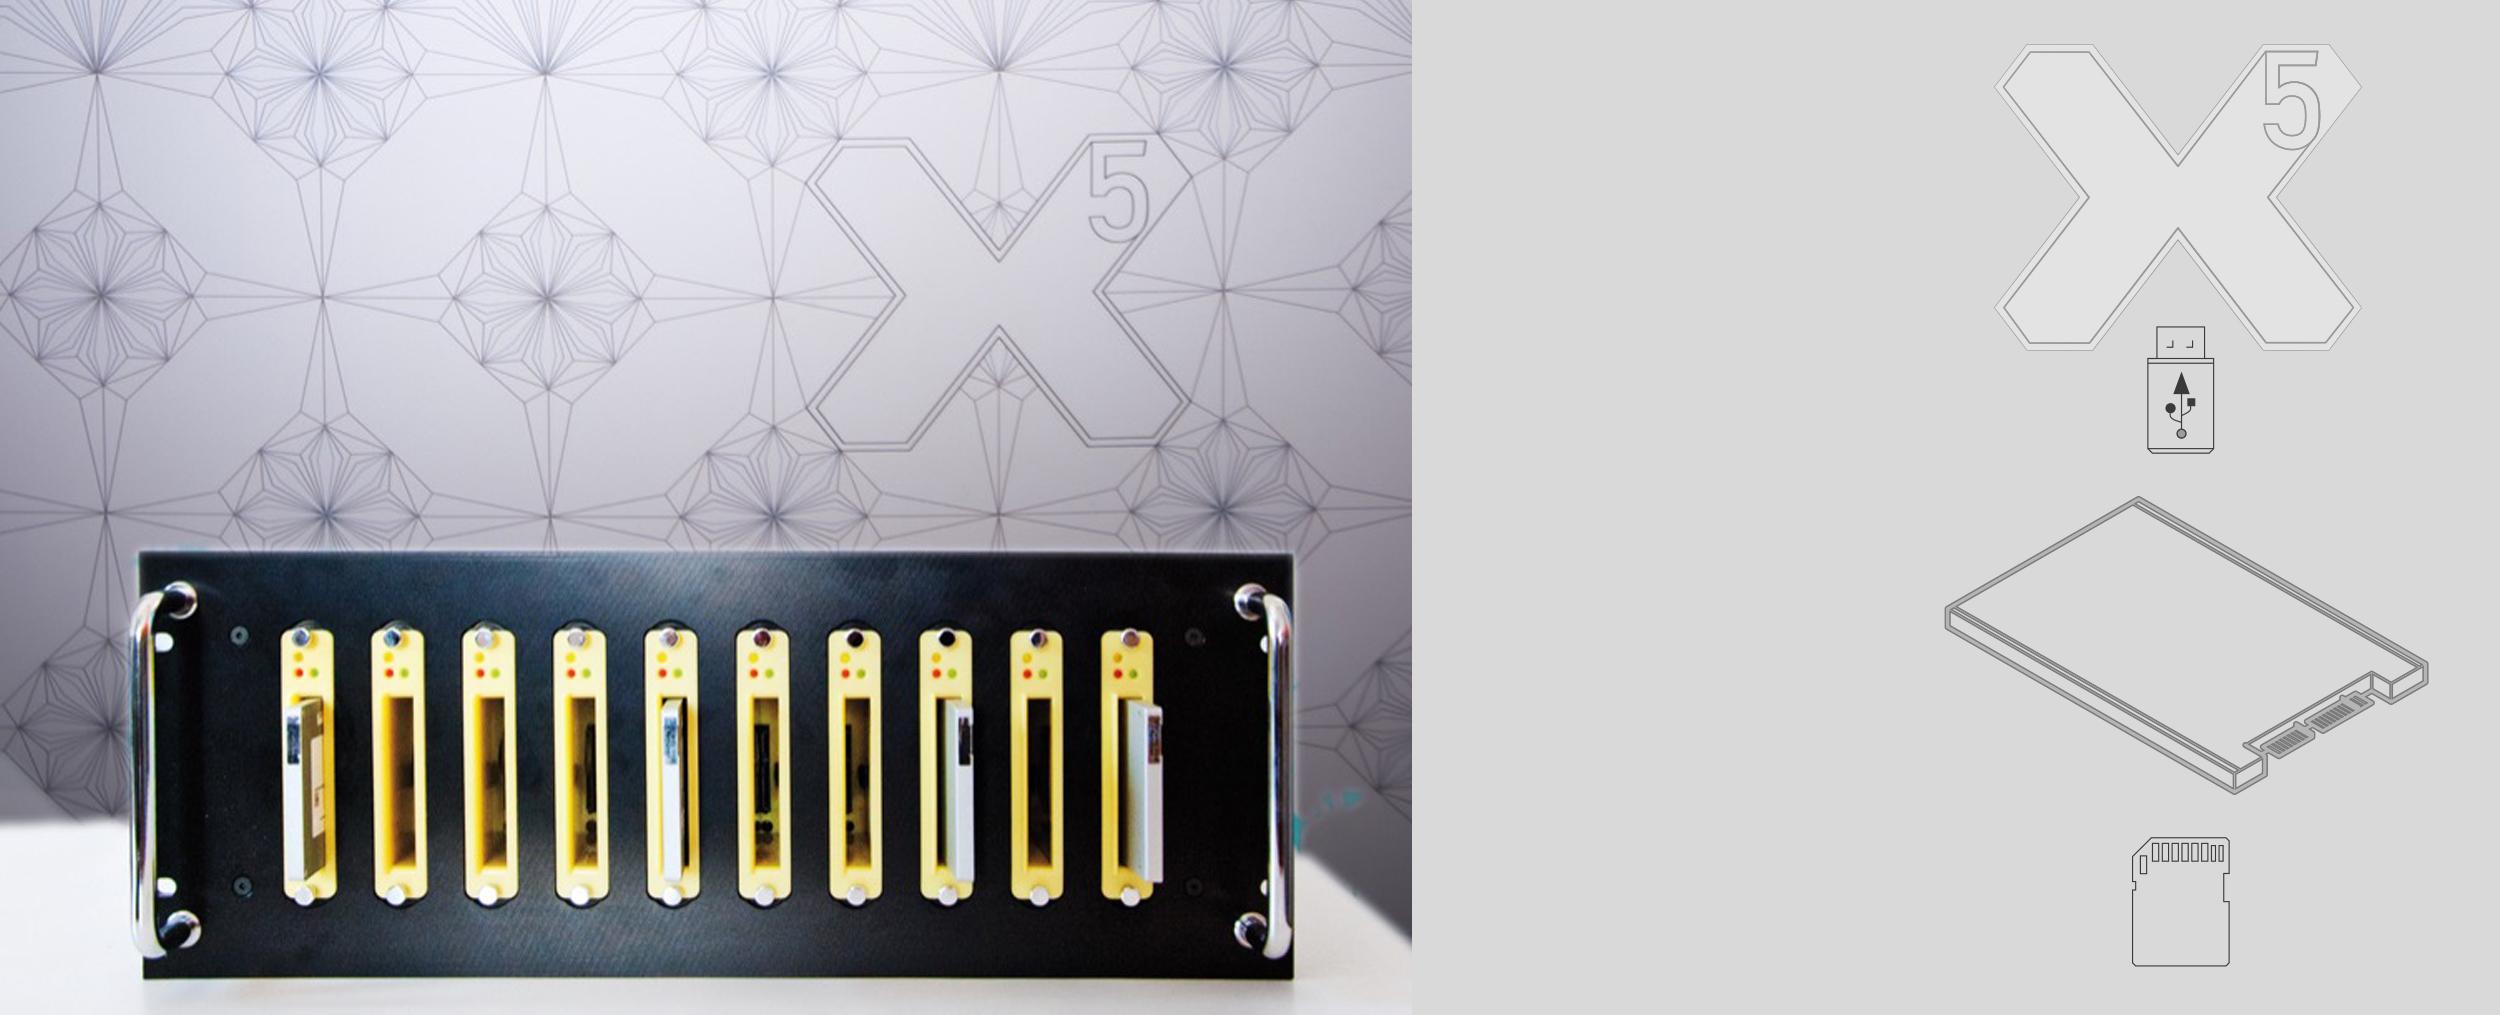 X-Net X5 SSD USB CF Kopiersystem